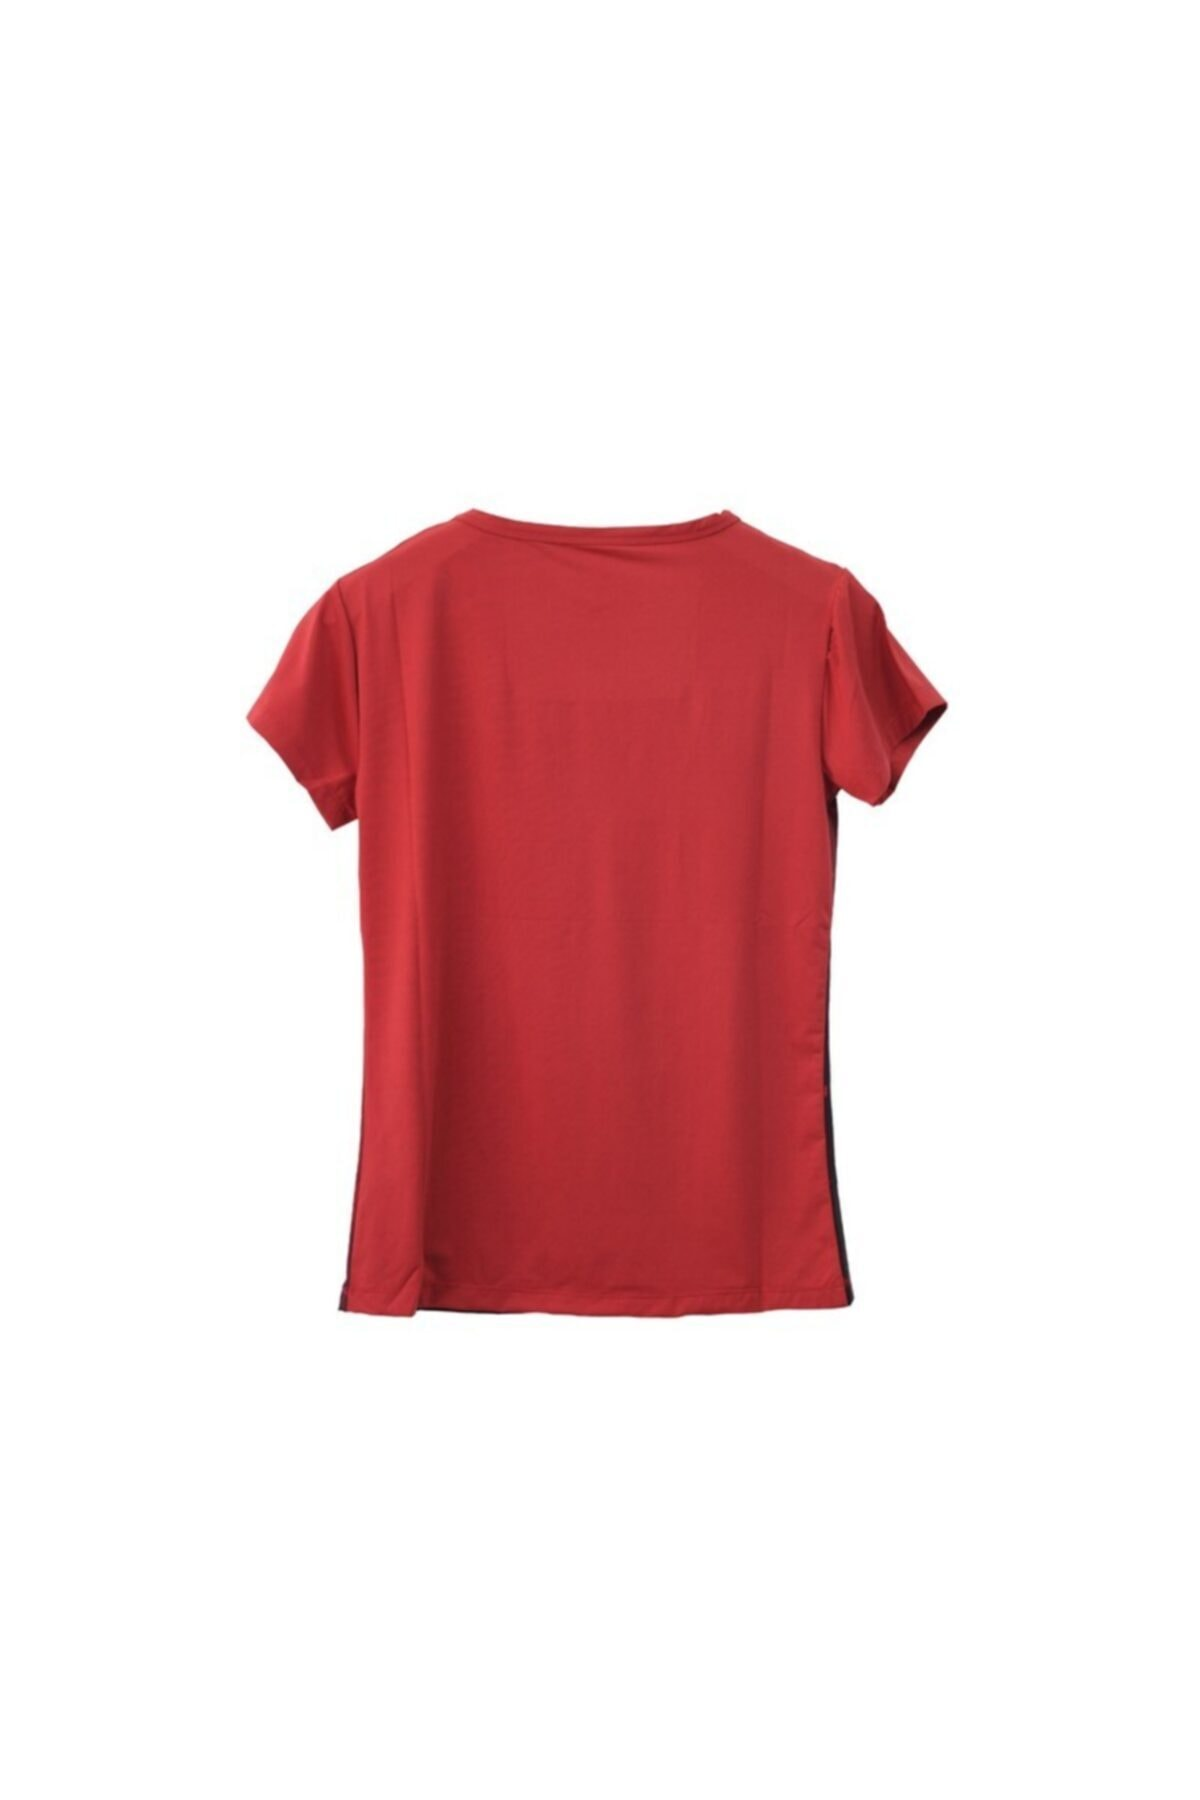 Exuma T-shirt W 2